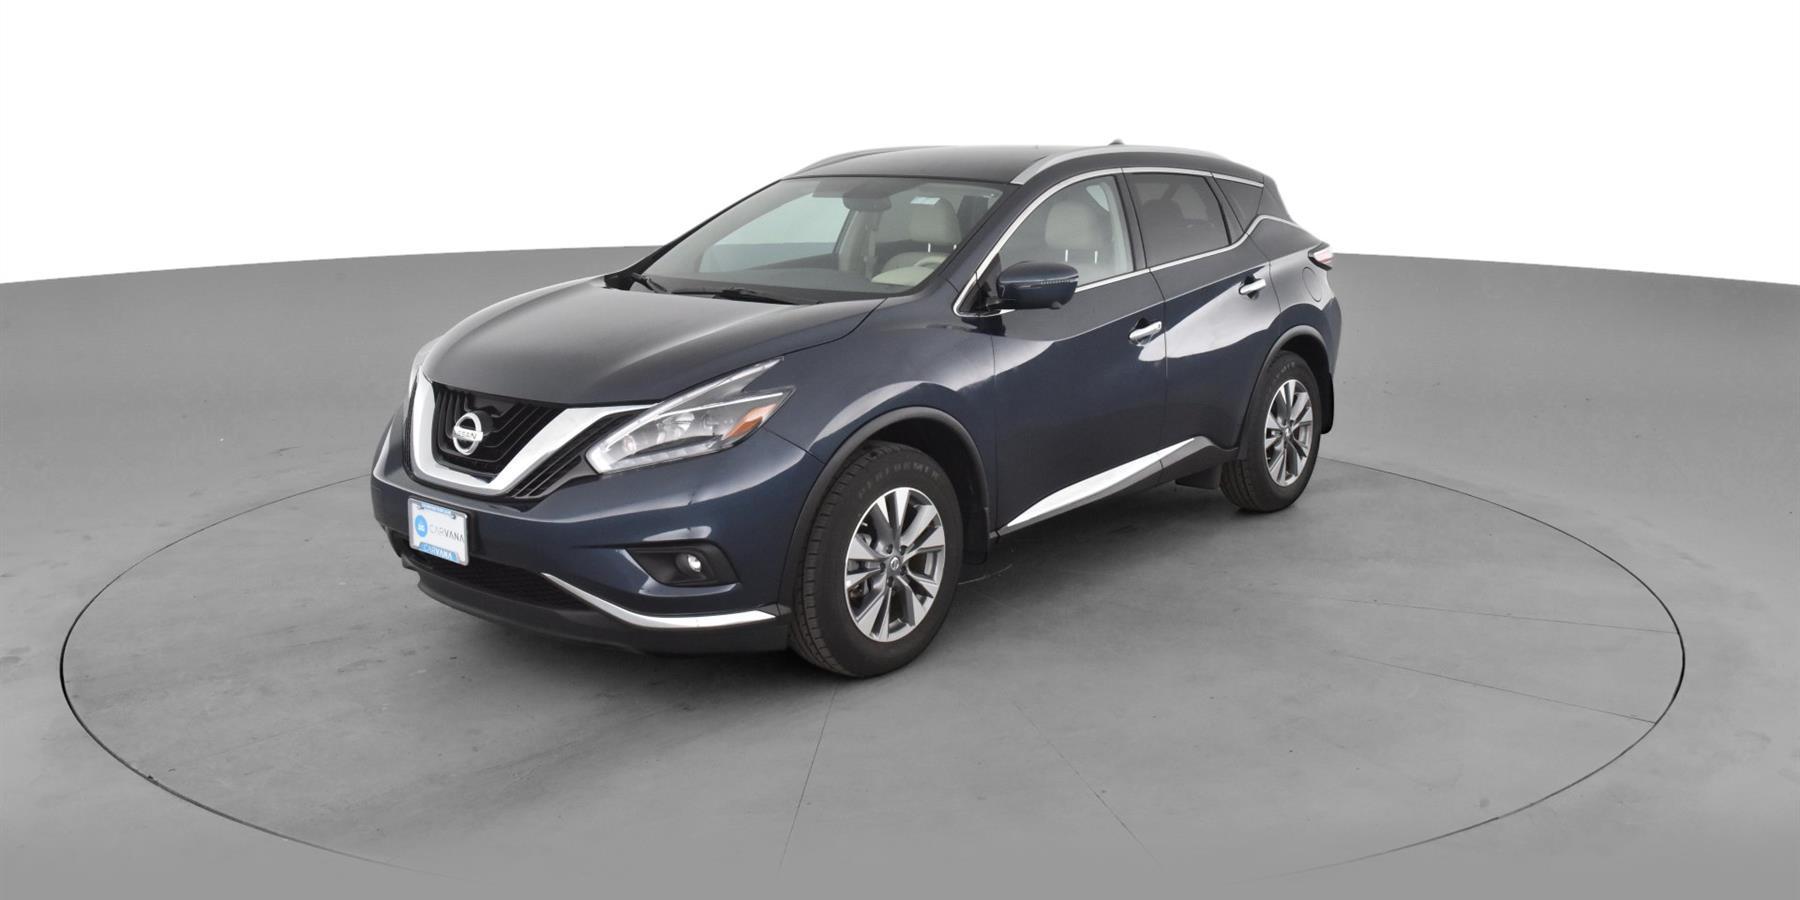 2018 Nissan Murano SL Sport Utility 4D for Sale | Carvana®